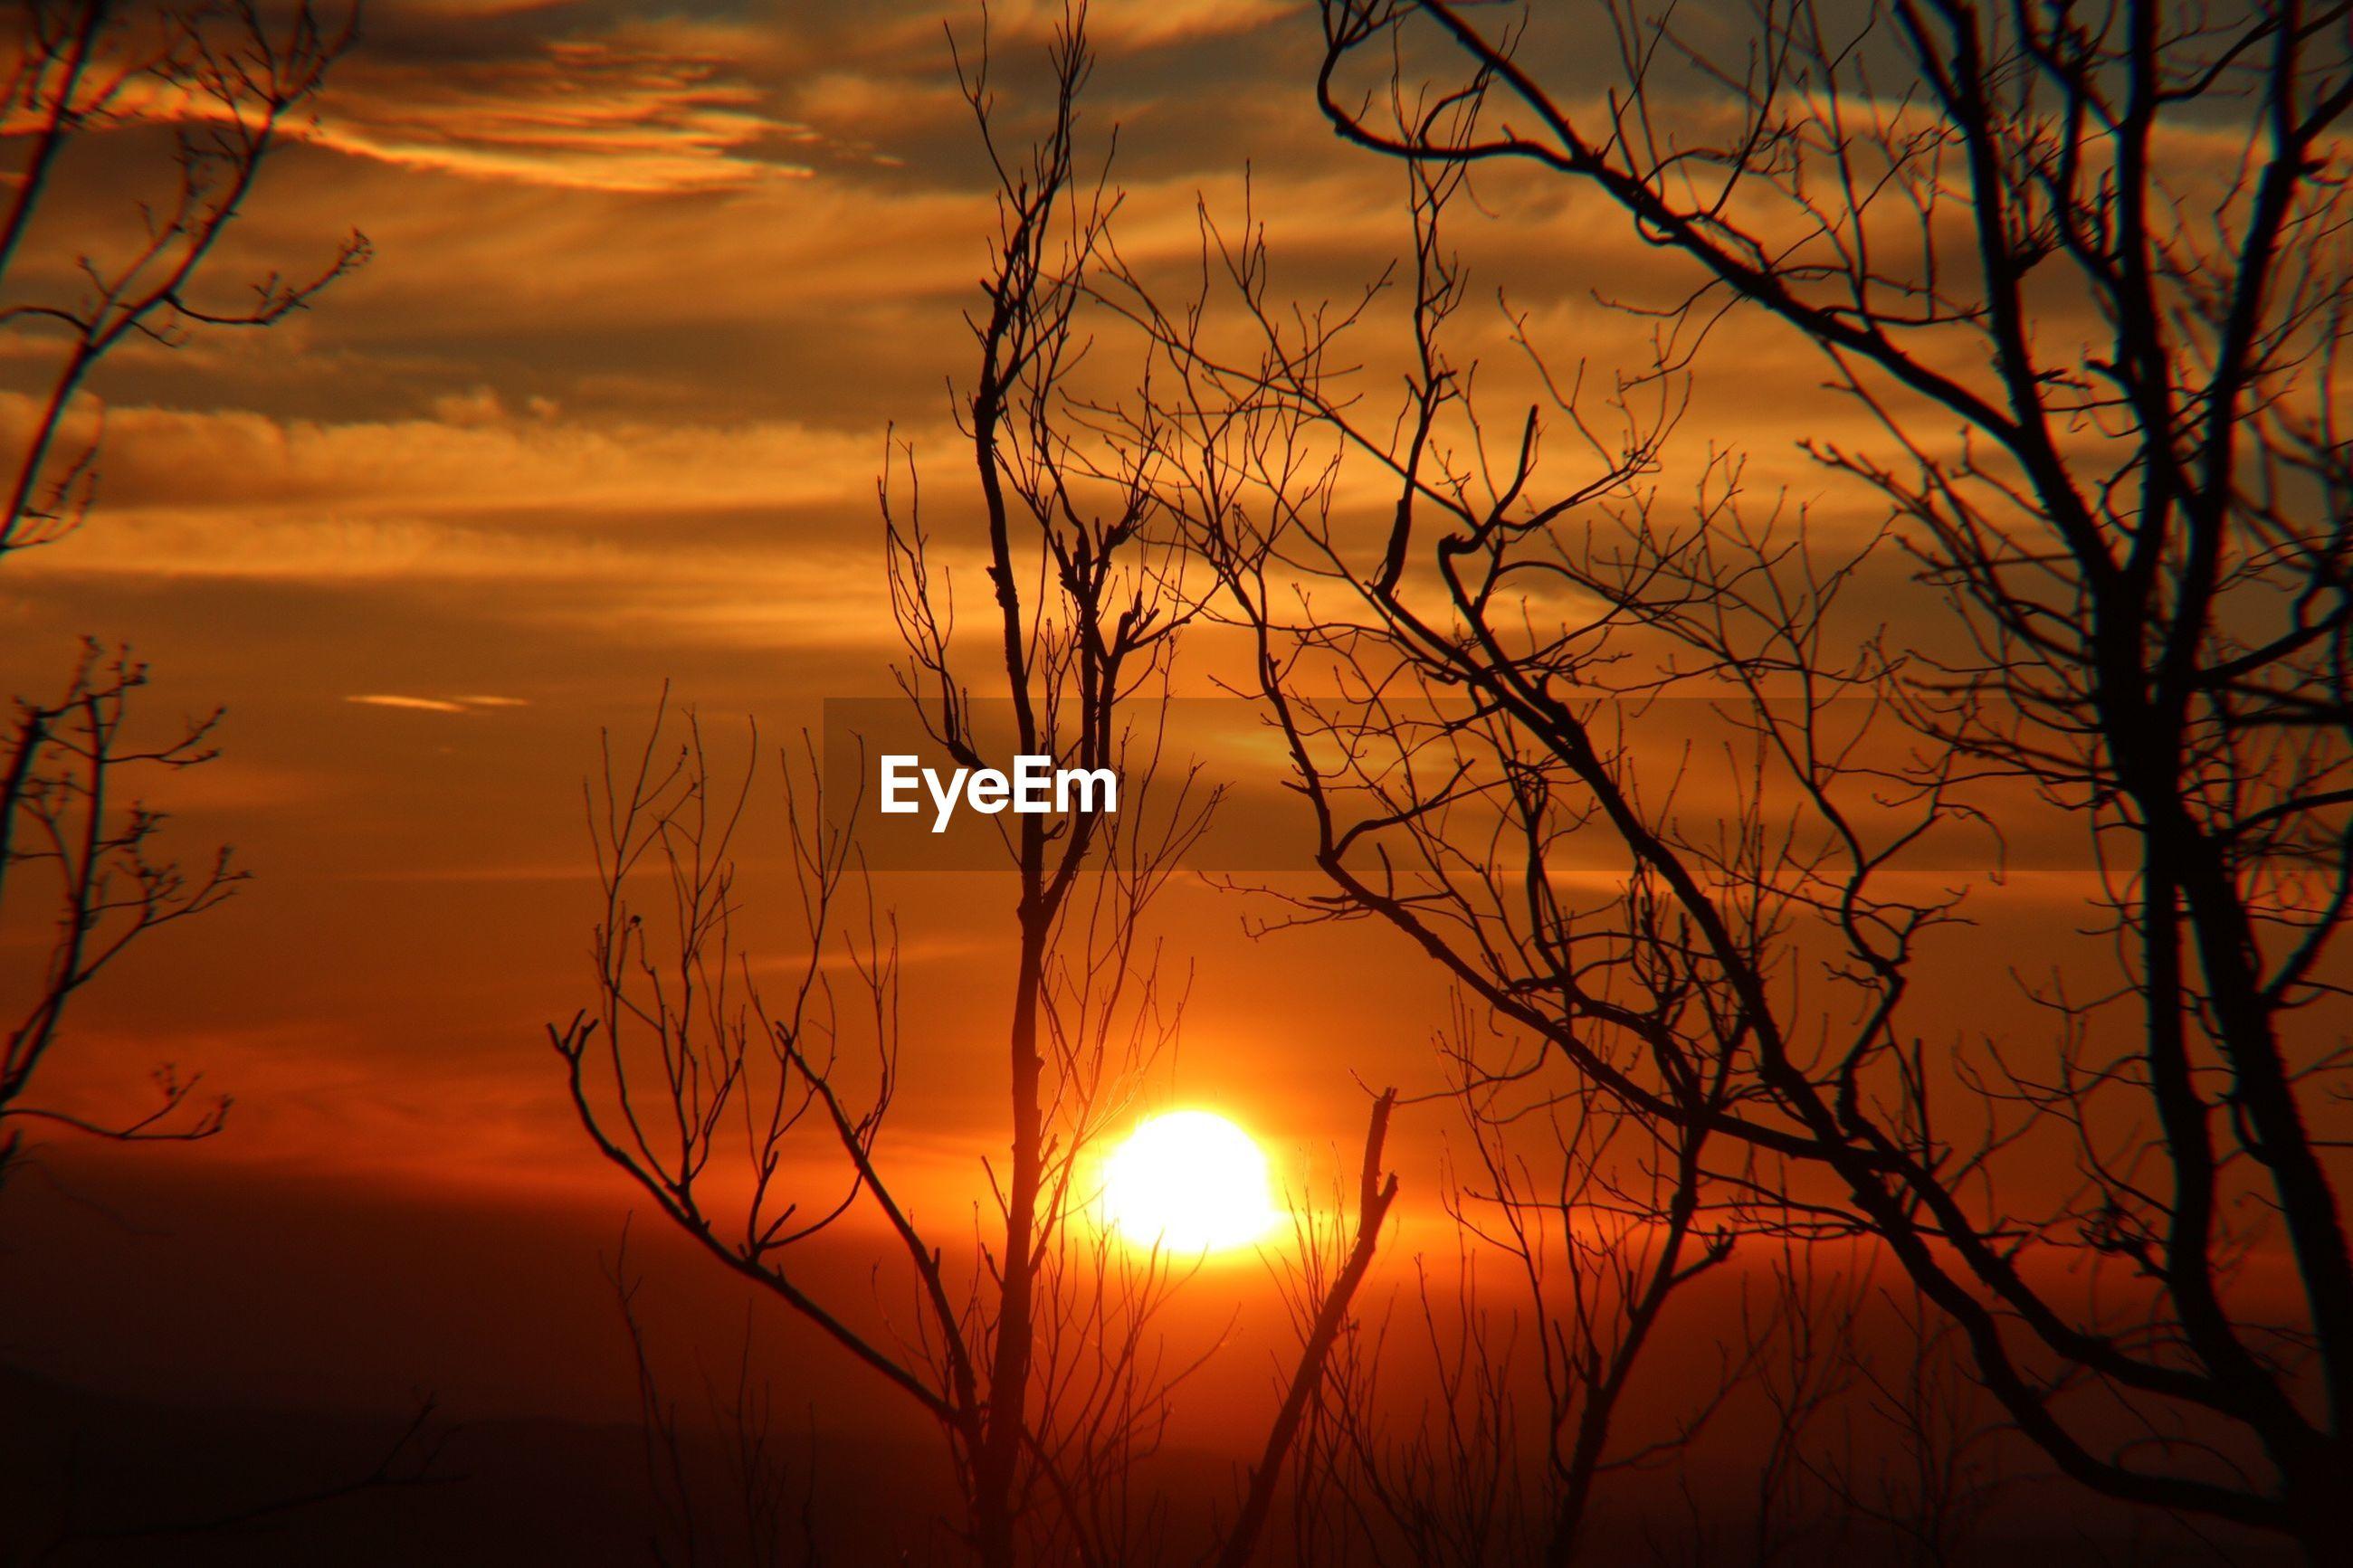 SILHOUETTE BARE TREE AGAINST ORANGE SKY DURING SUNSET